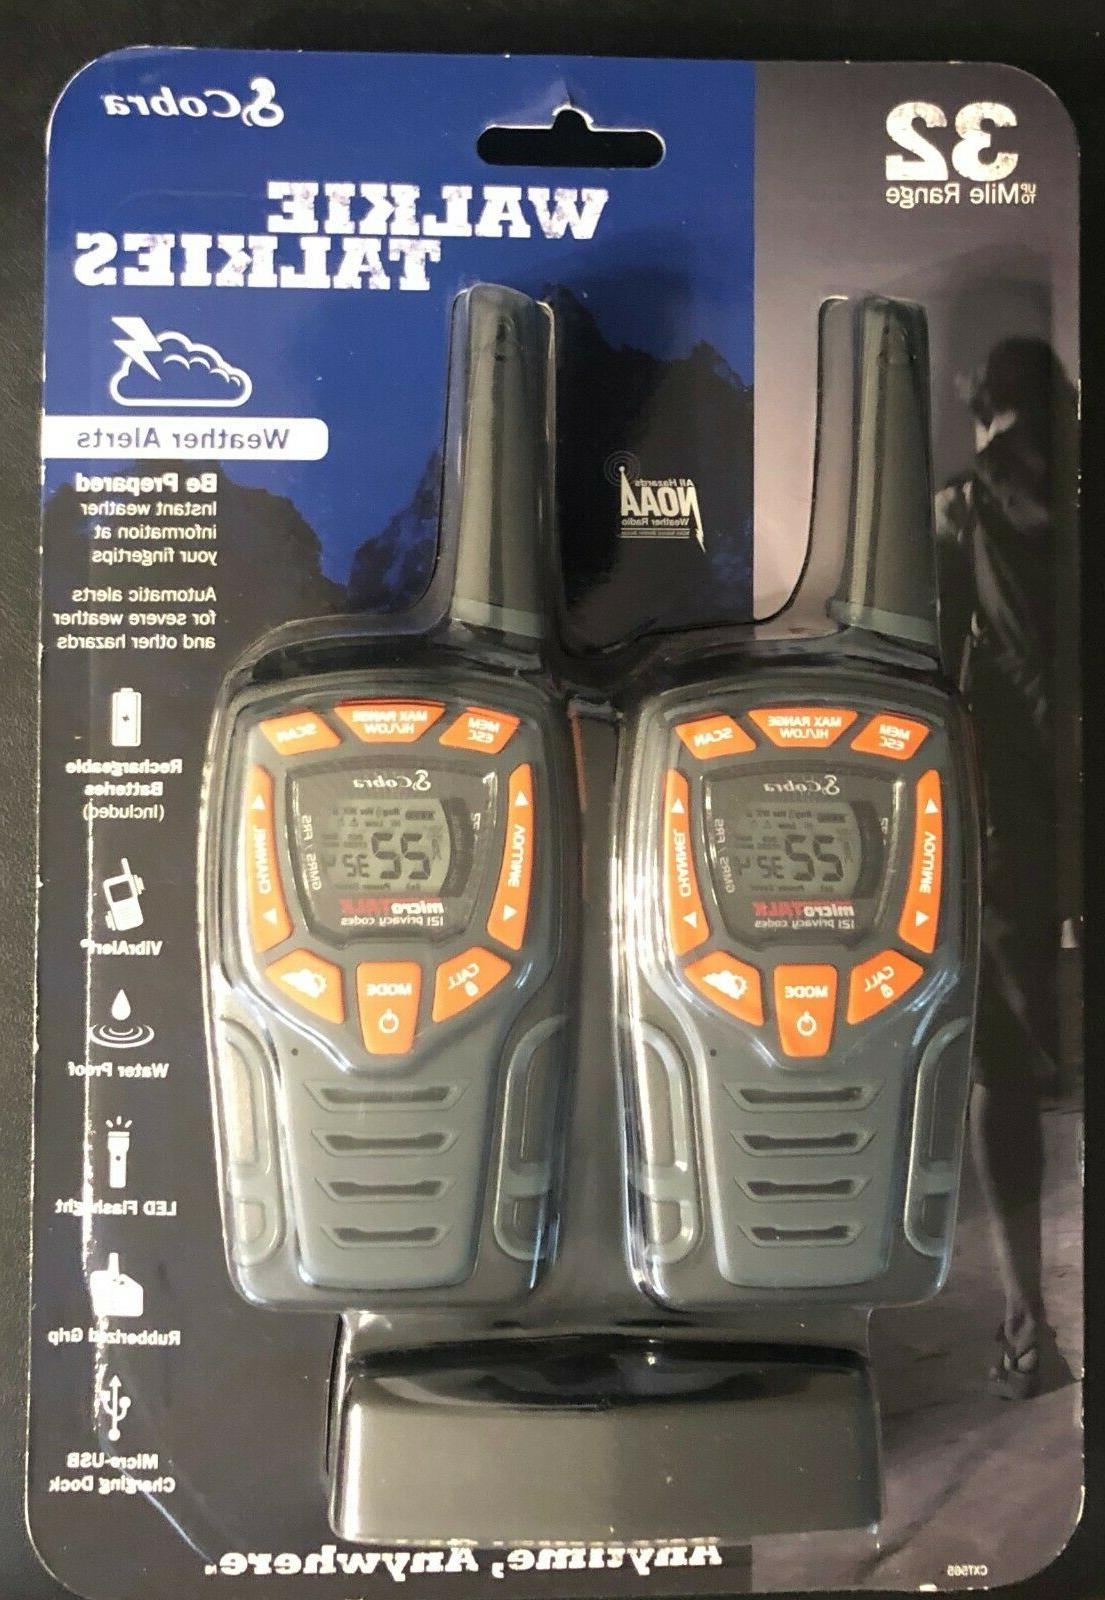 cxt565 two way radio waterproof